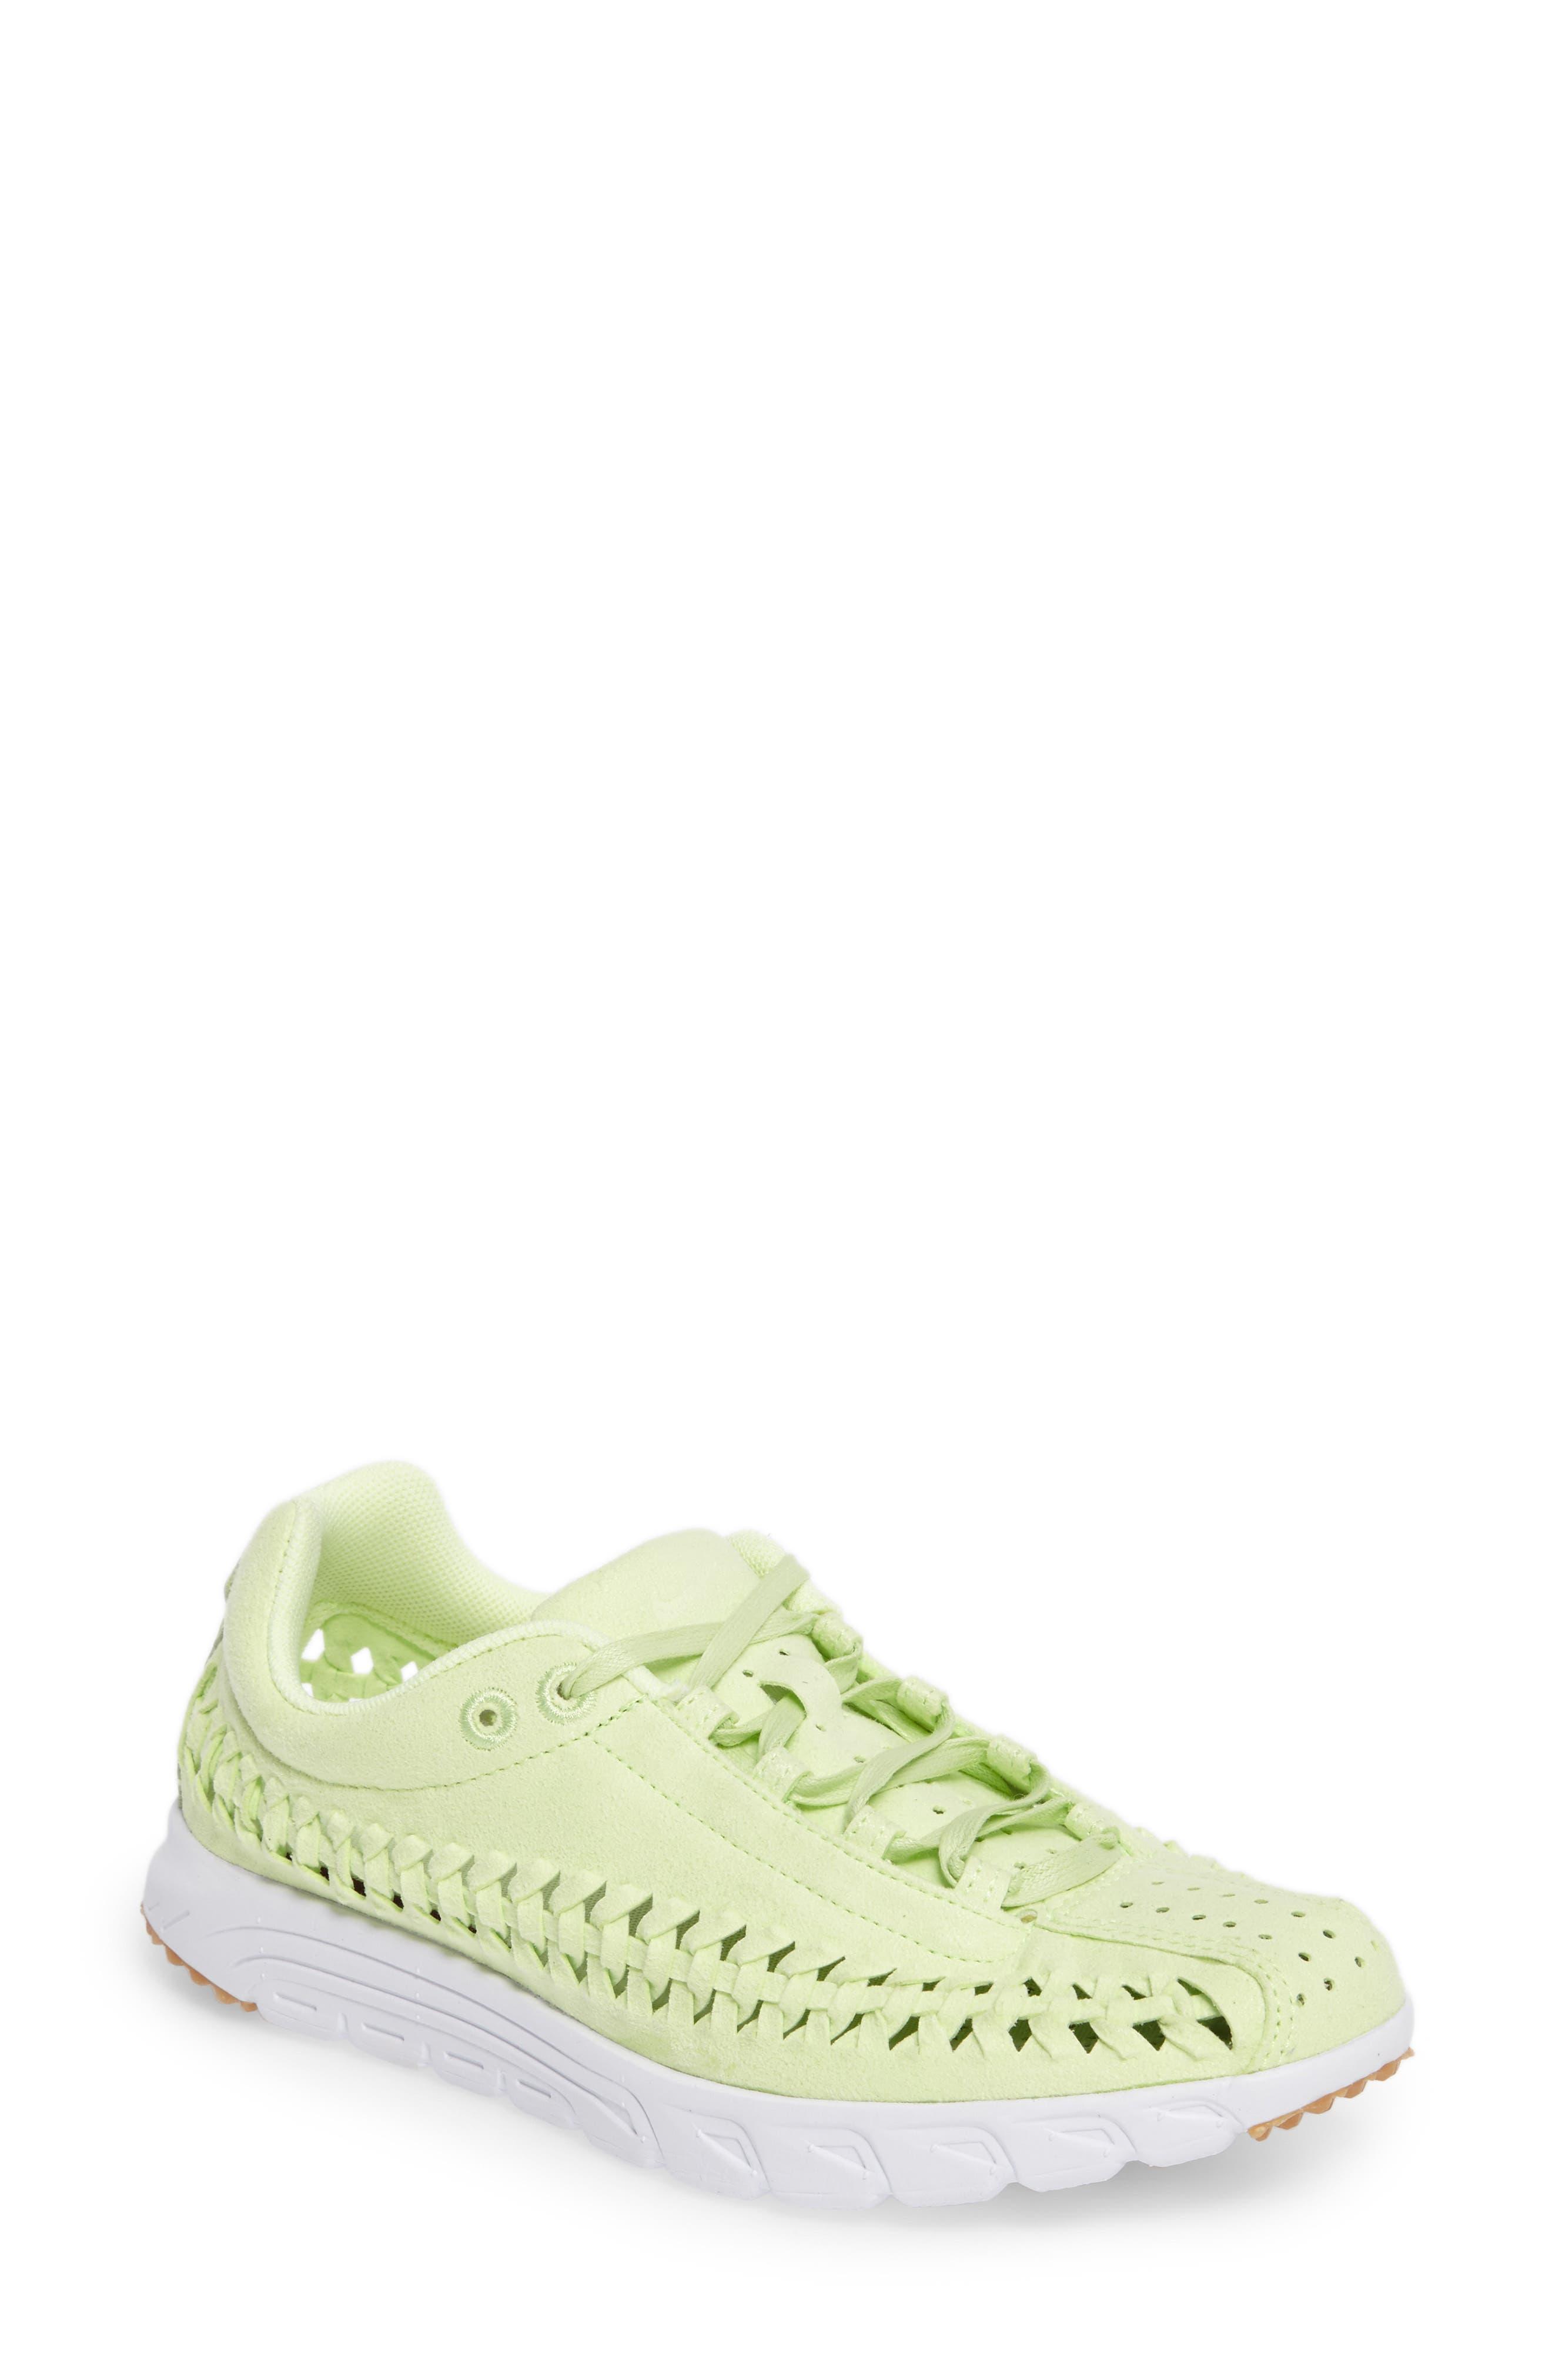 Mayfly Woven QS Sneaker,                             Main thumbnail 1, color,                             301